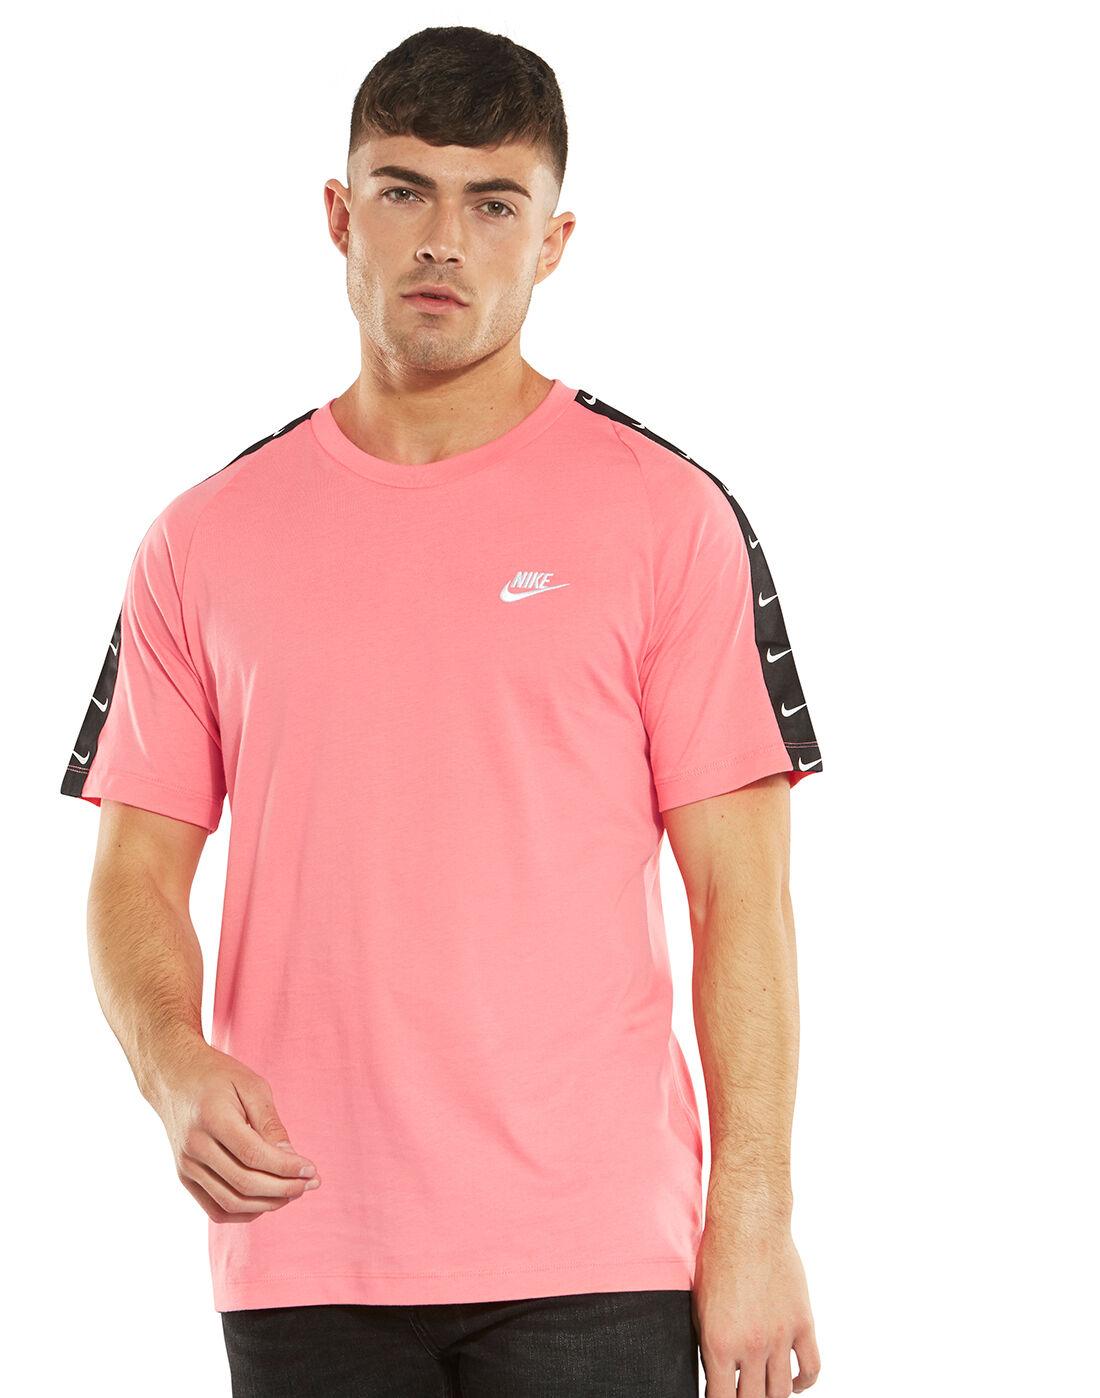 pink and black nike t shirt